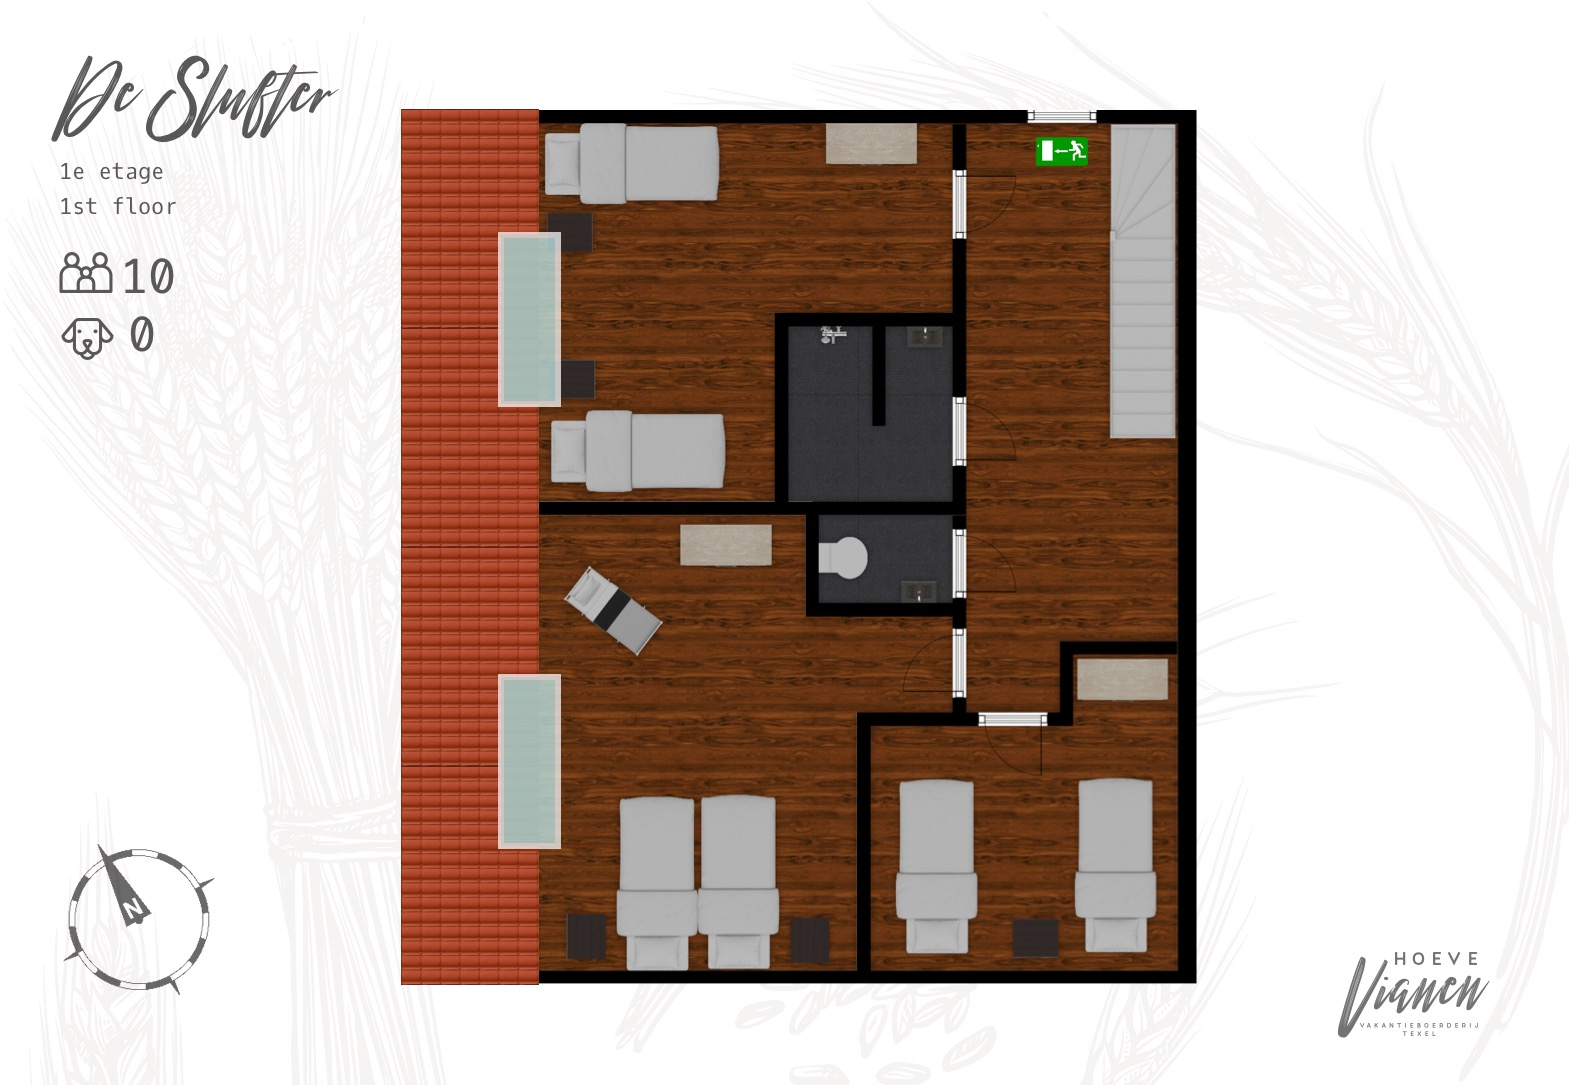 de-slufter-1e-etage